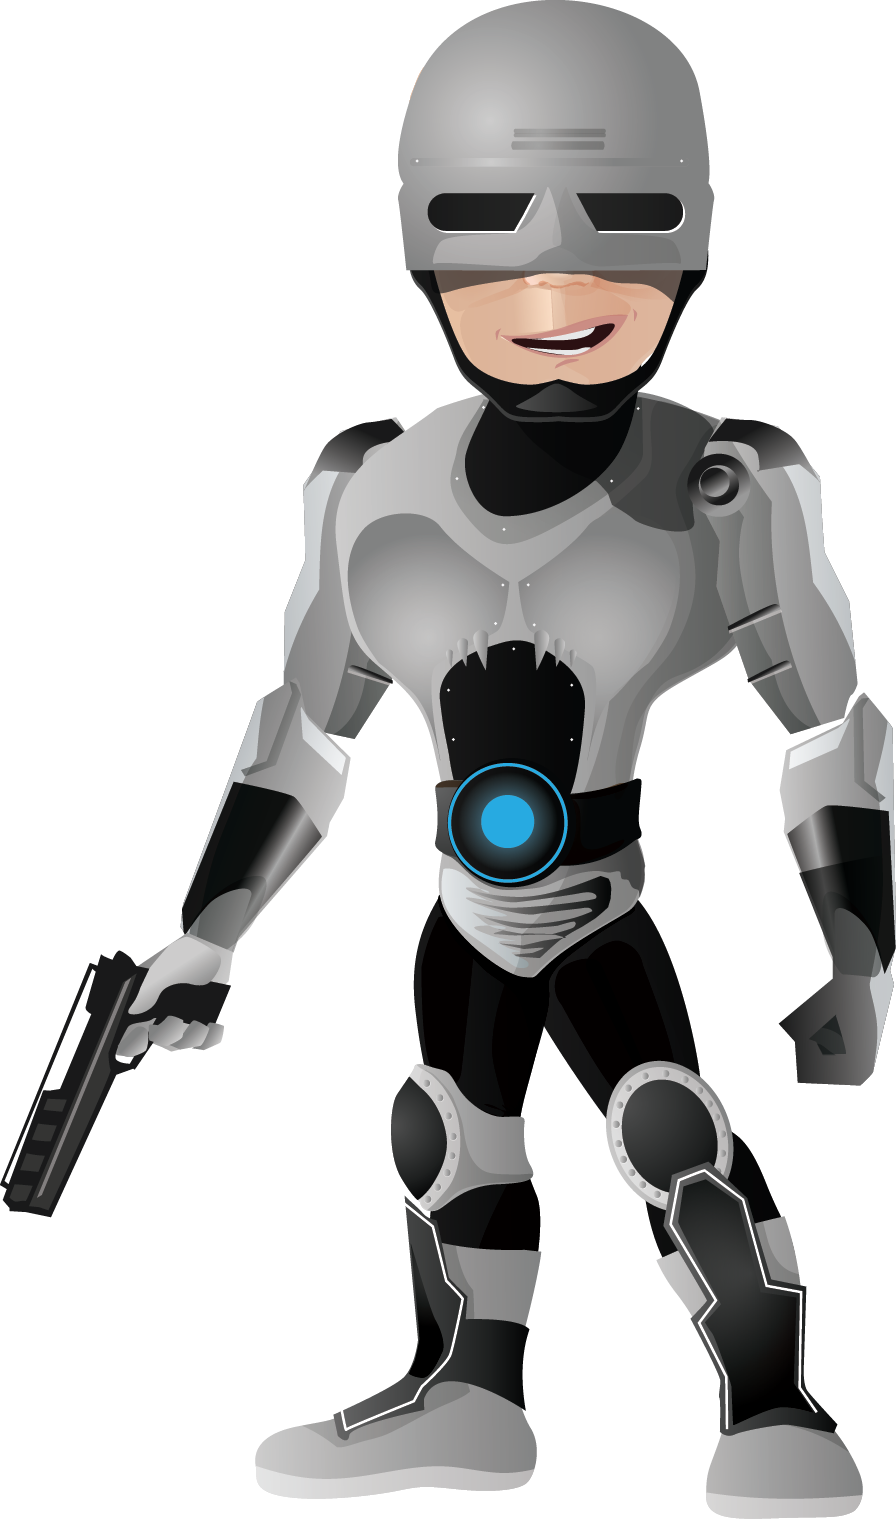 Cyborg clipart.